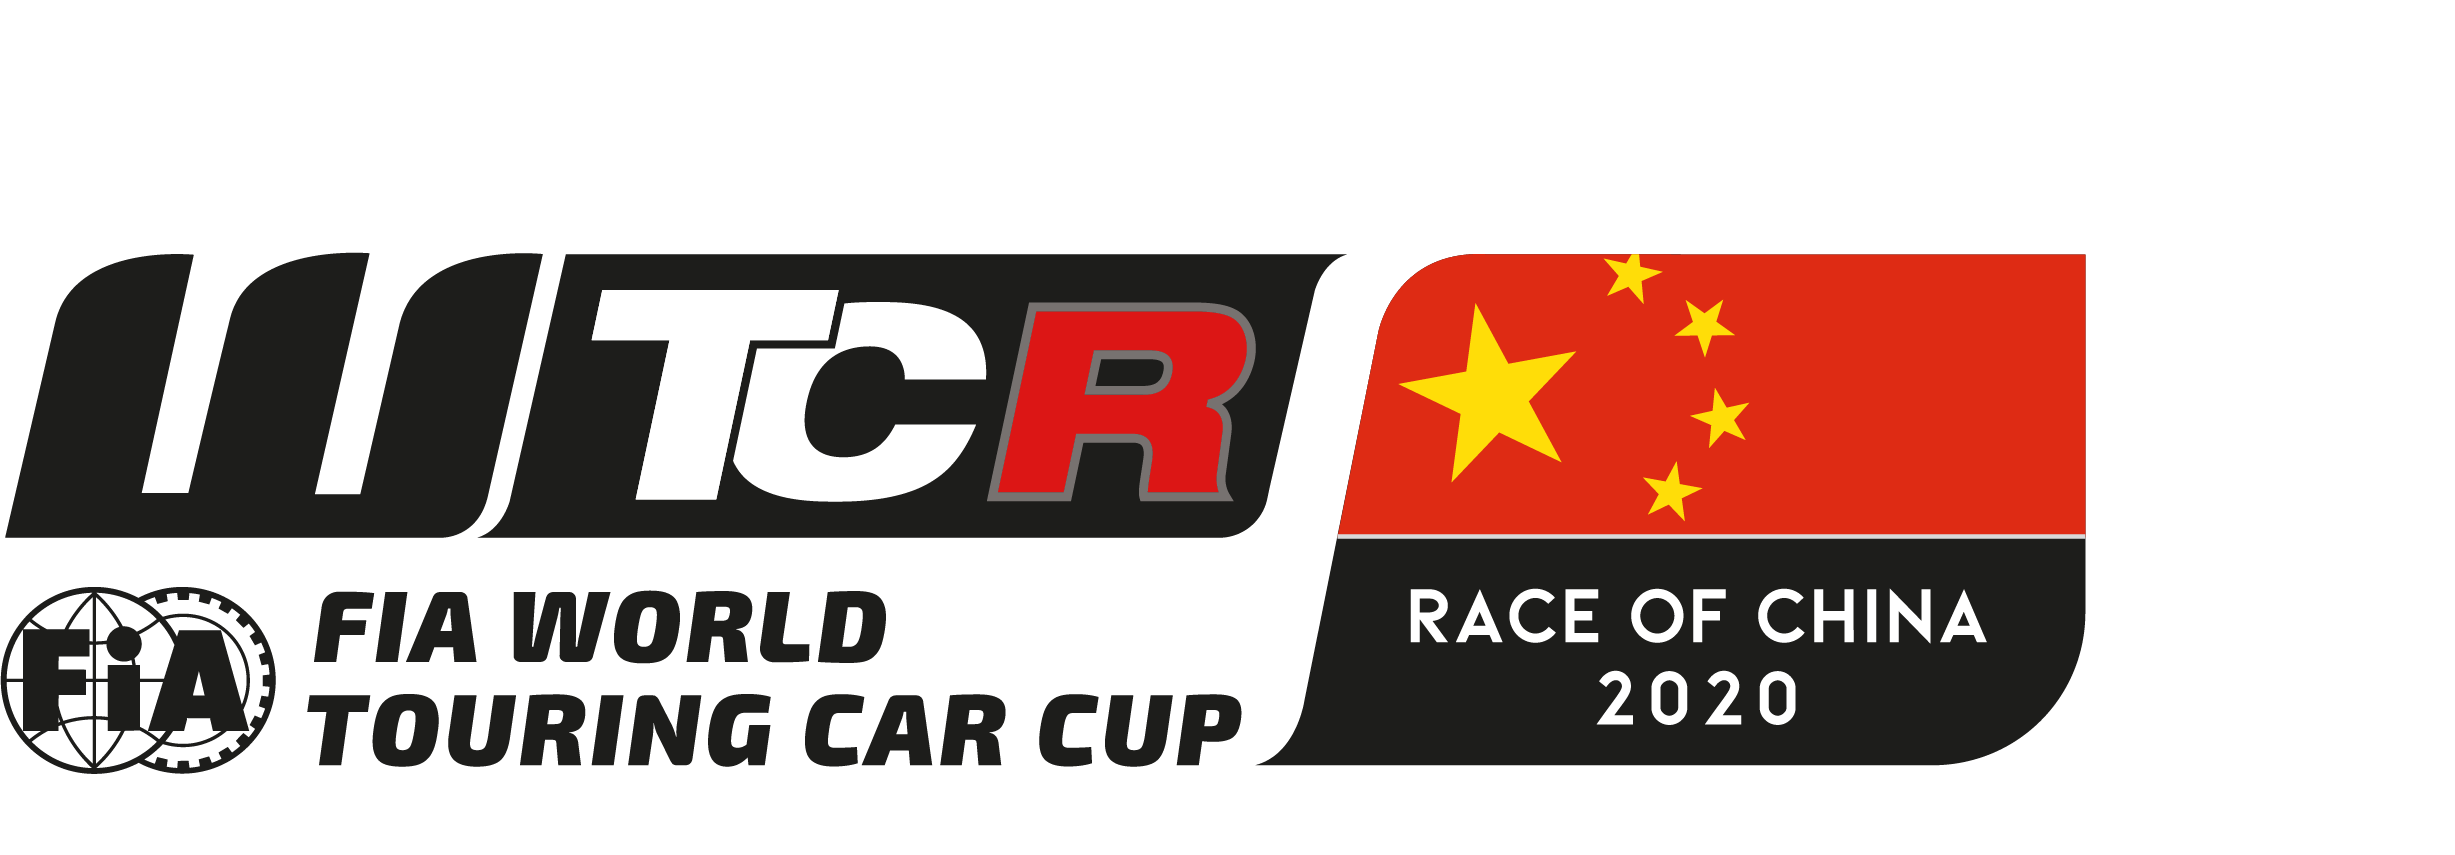 Race of China